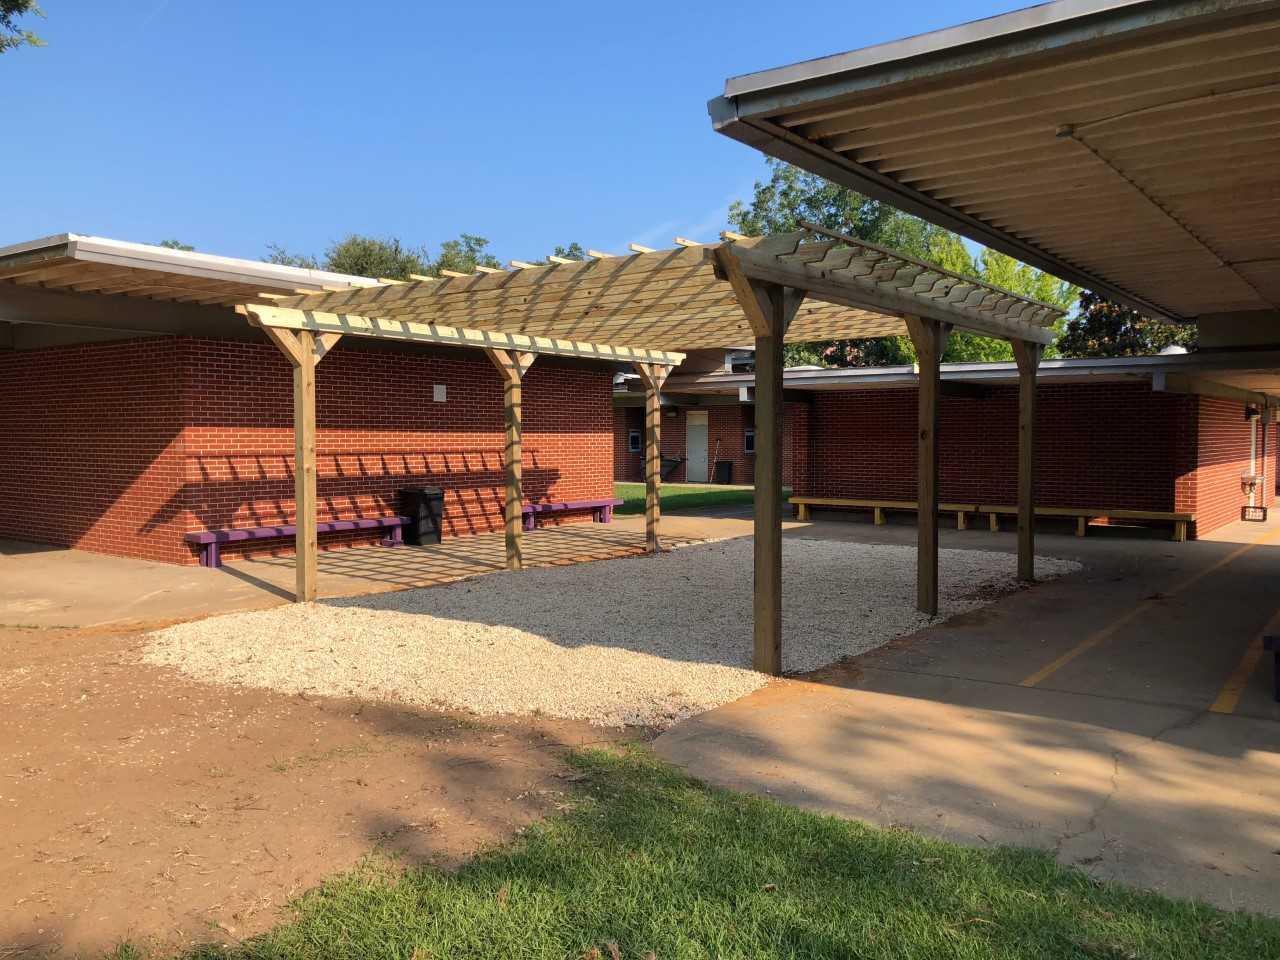 daphne elementary project finished_1533590013173.jpg.jpg